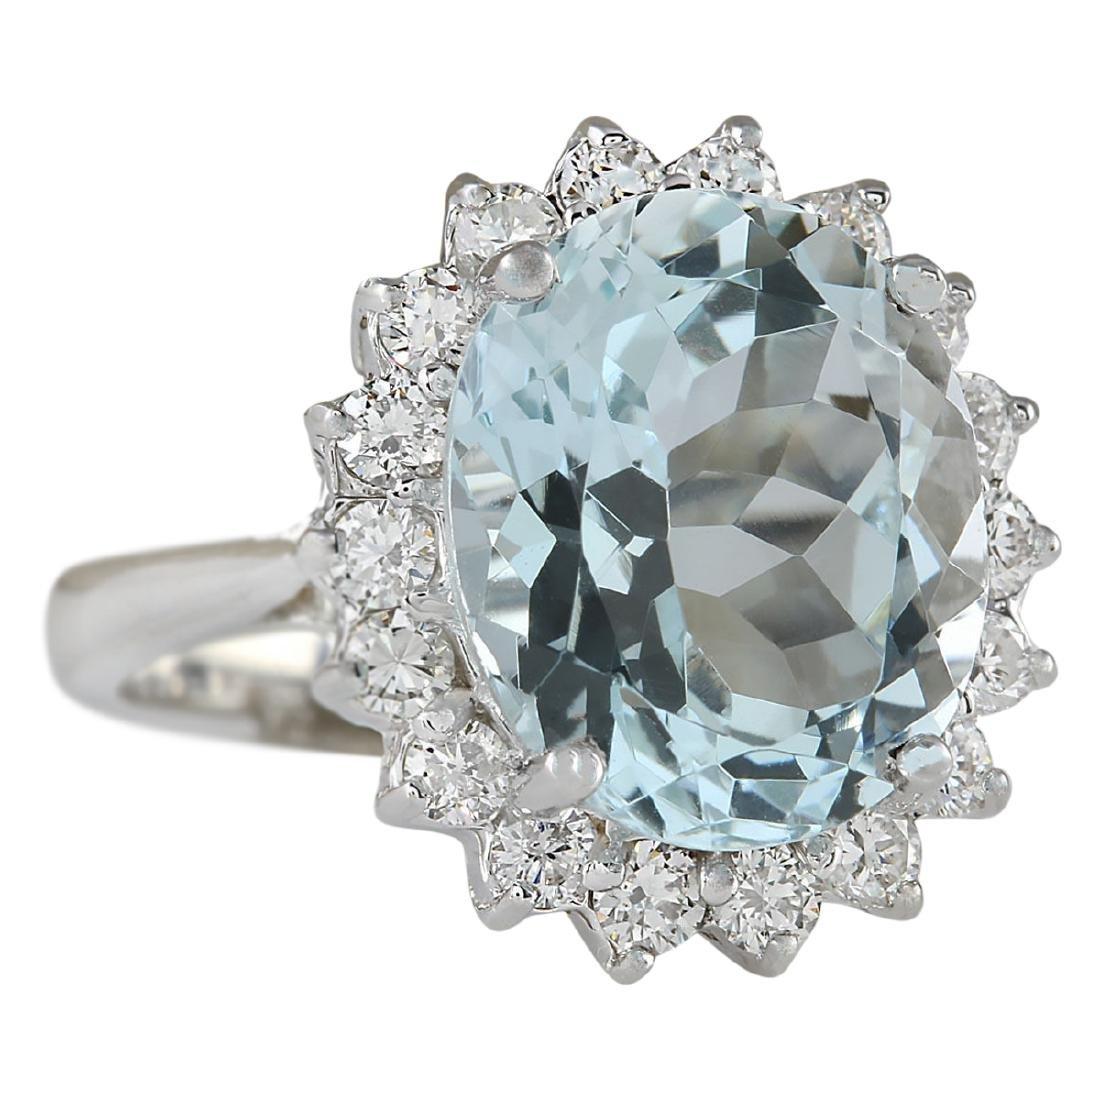 6.80 CTW Natural Aquamarine And Diamond Ring In 18K - 2